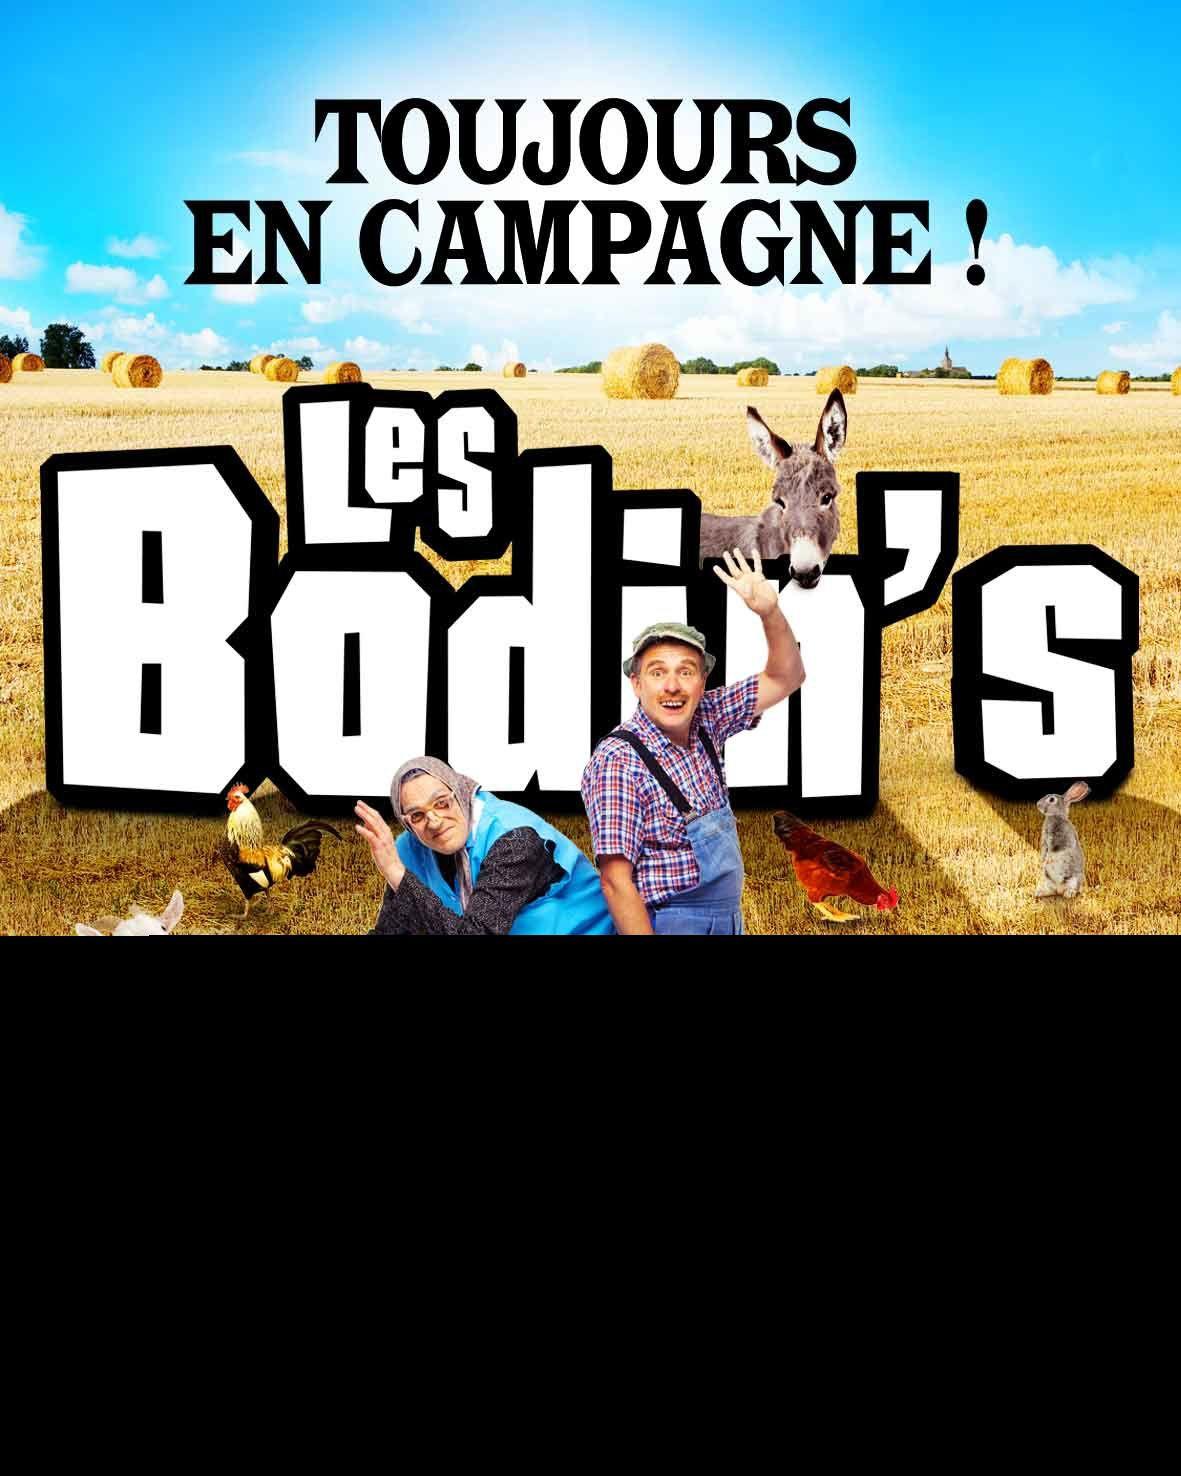 Les Bodin's vont pimenter DALS jeudi soir et interagir avec Camille Combal et Karine Ferri.